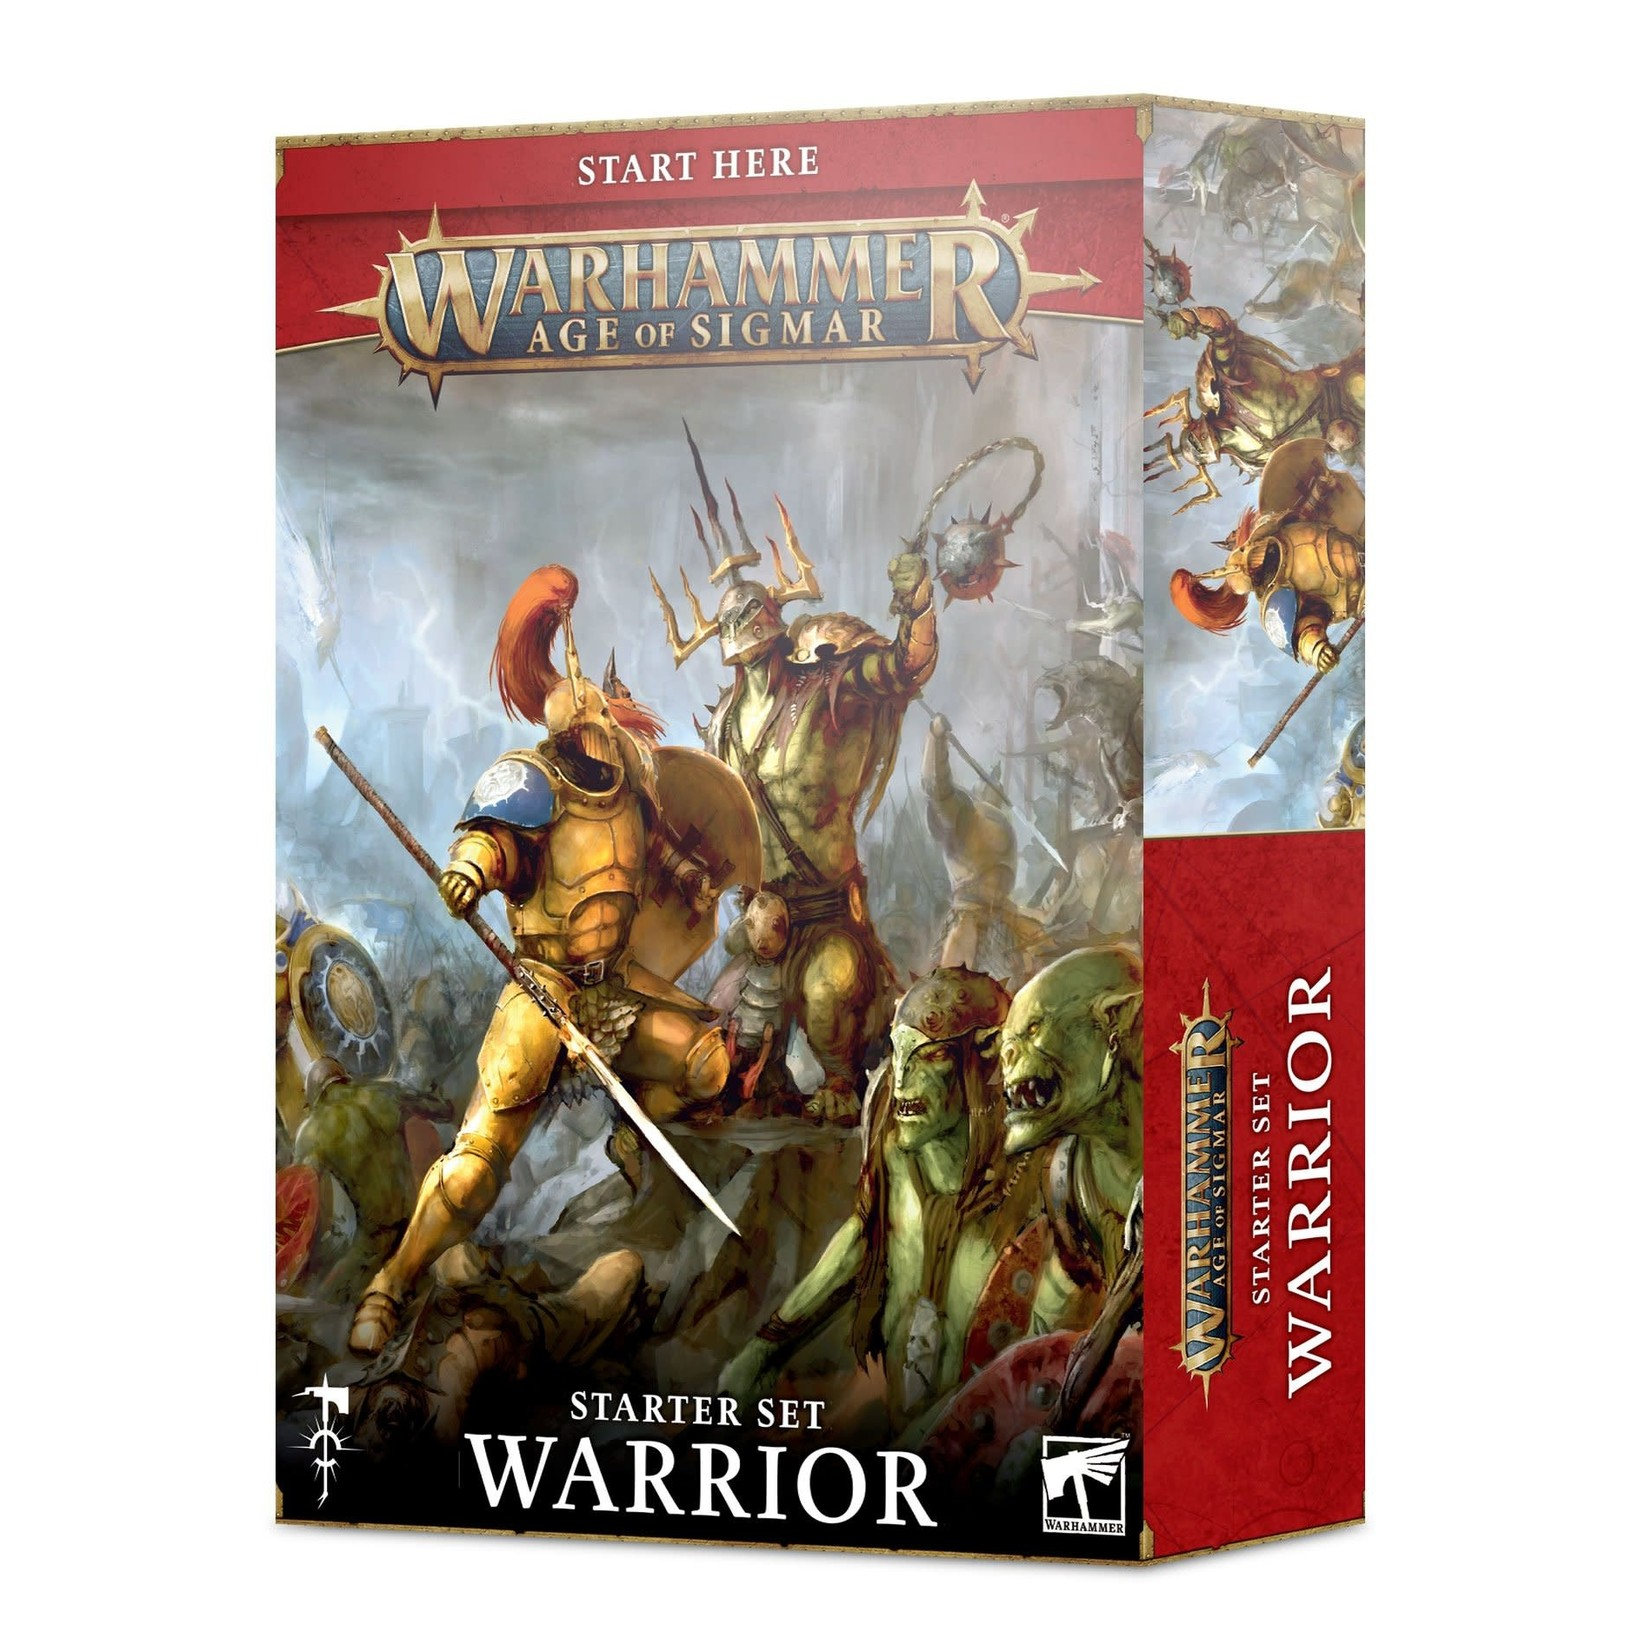 Games Workshop Warhammer Age of Sigmar: Warrior Starter Set